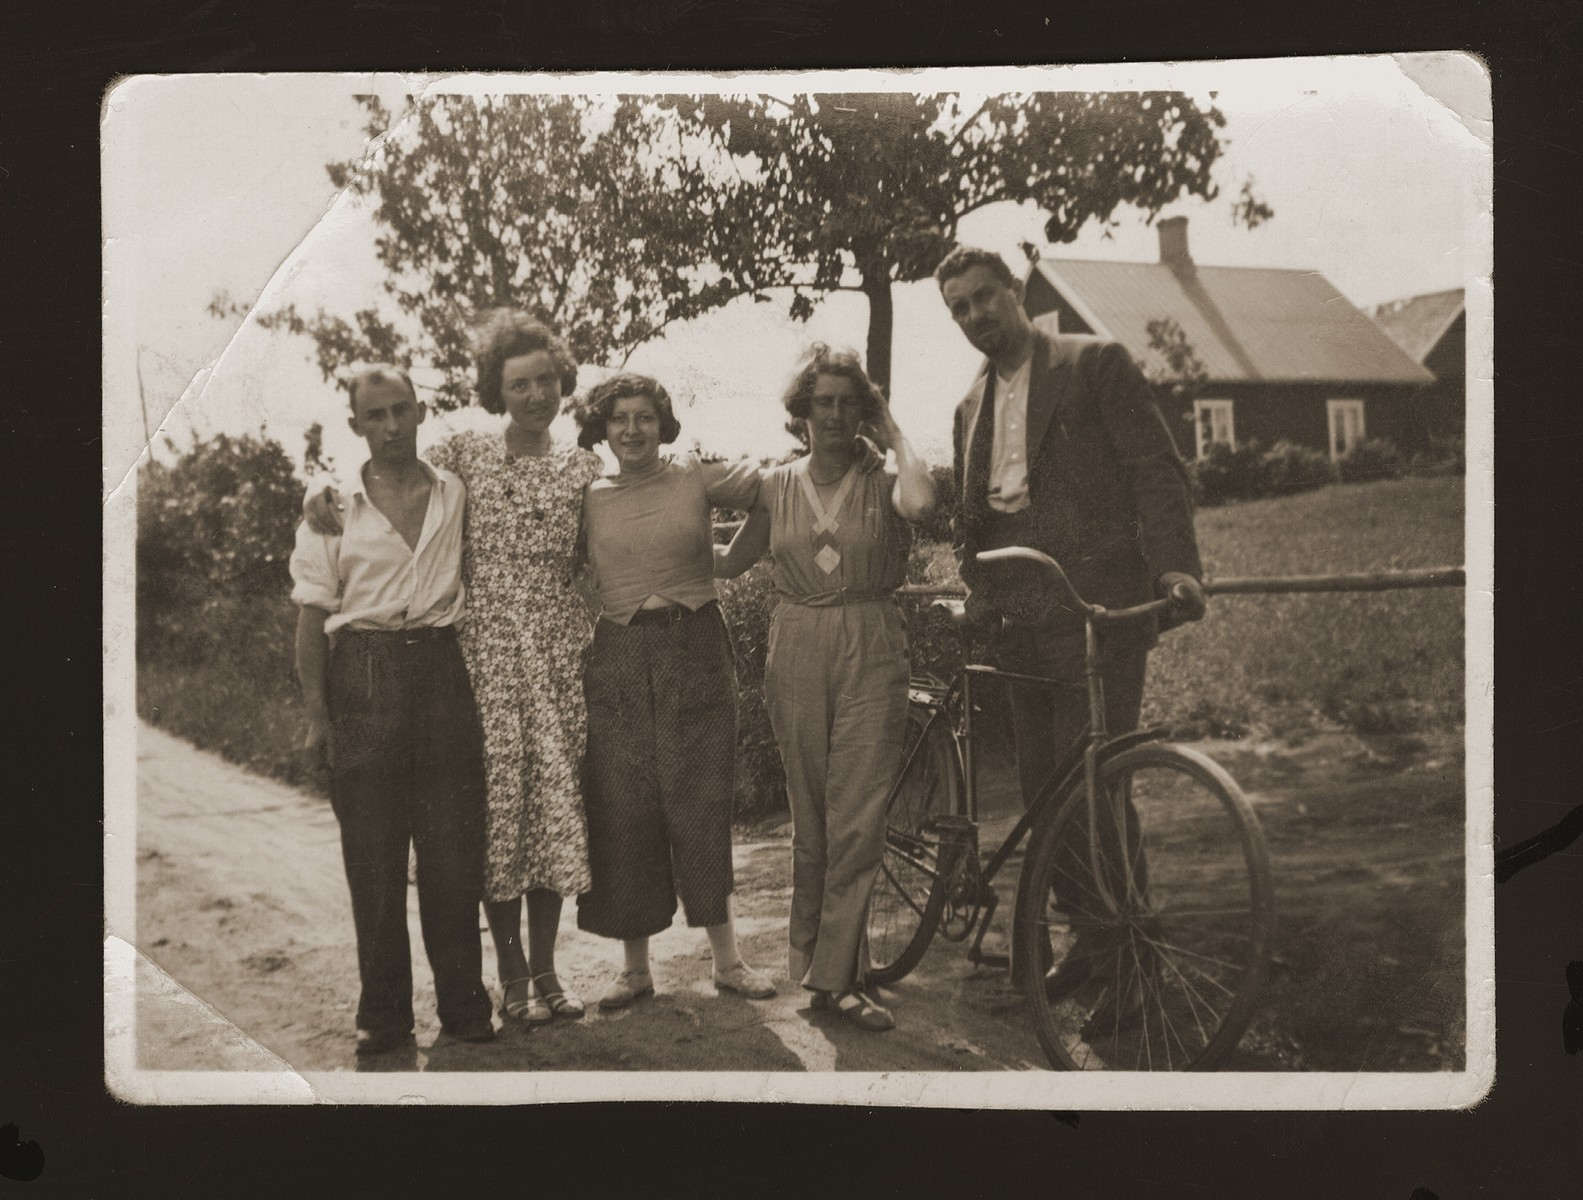 Eugene Goldberger poses with Danish acquaintances shortly after moving to Copenhagen.